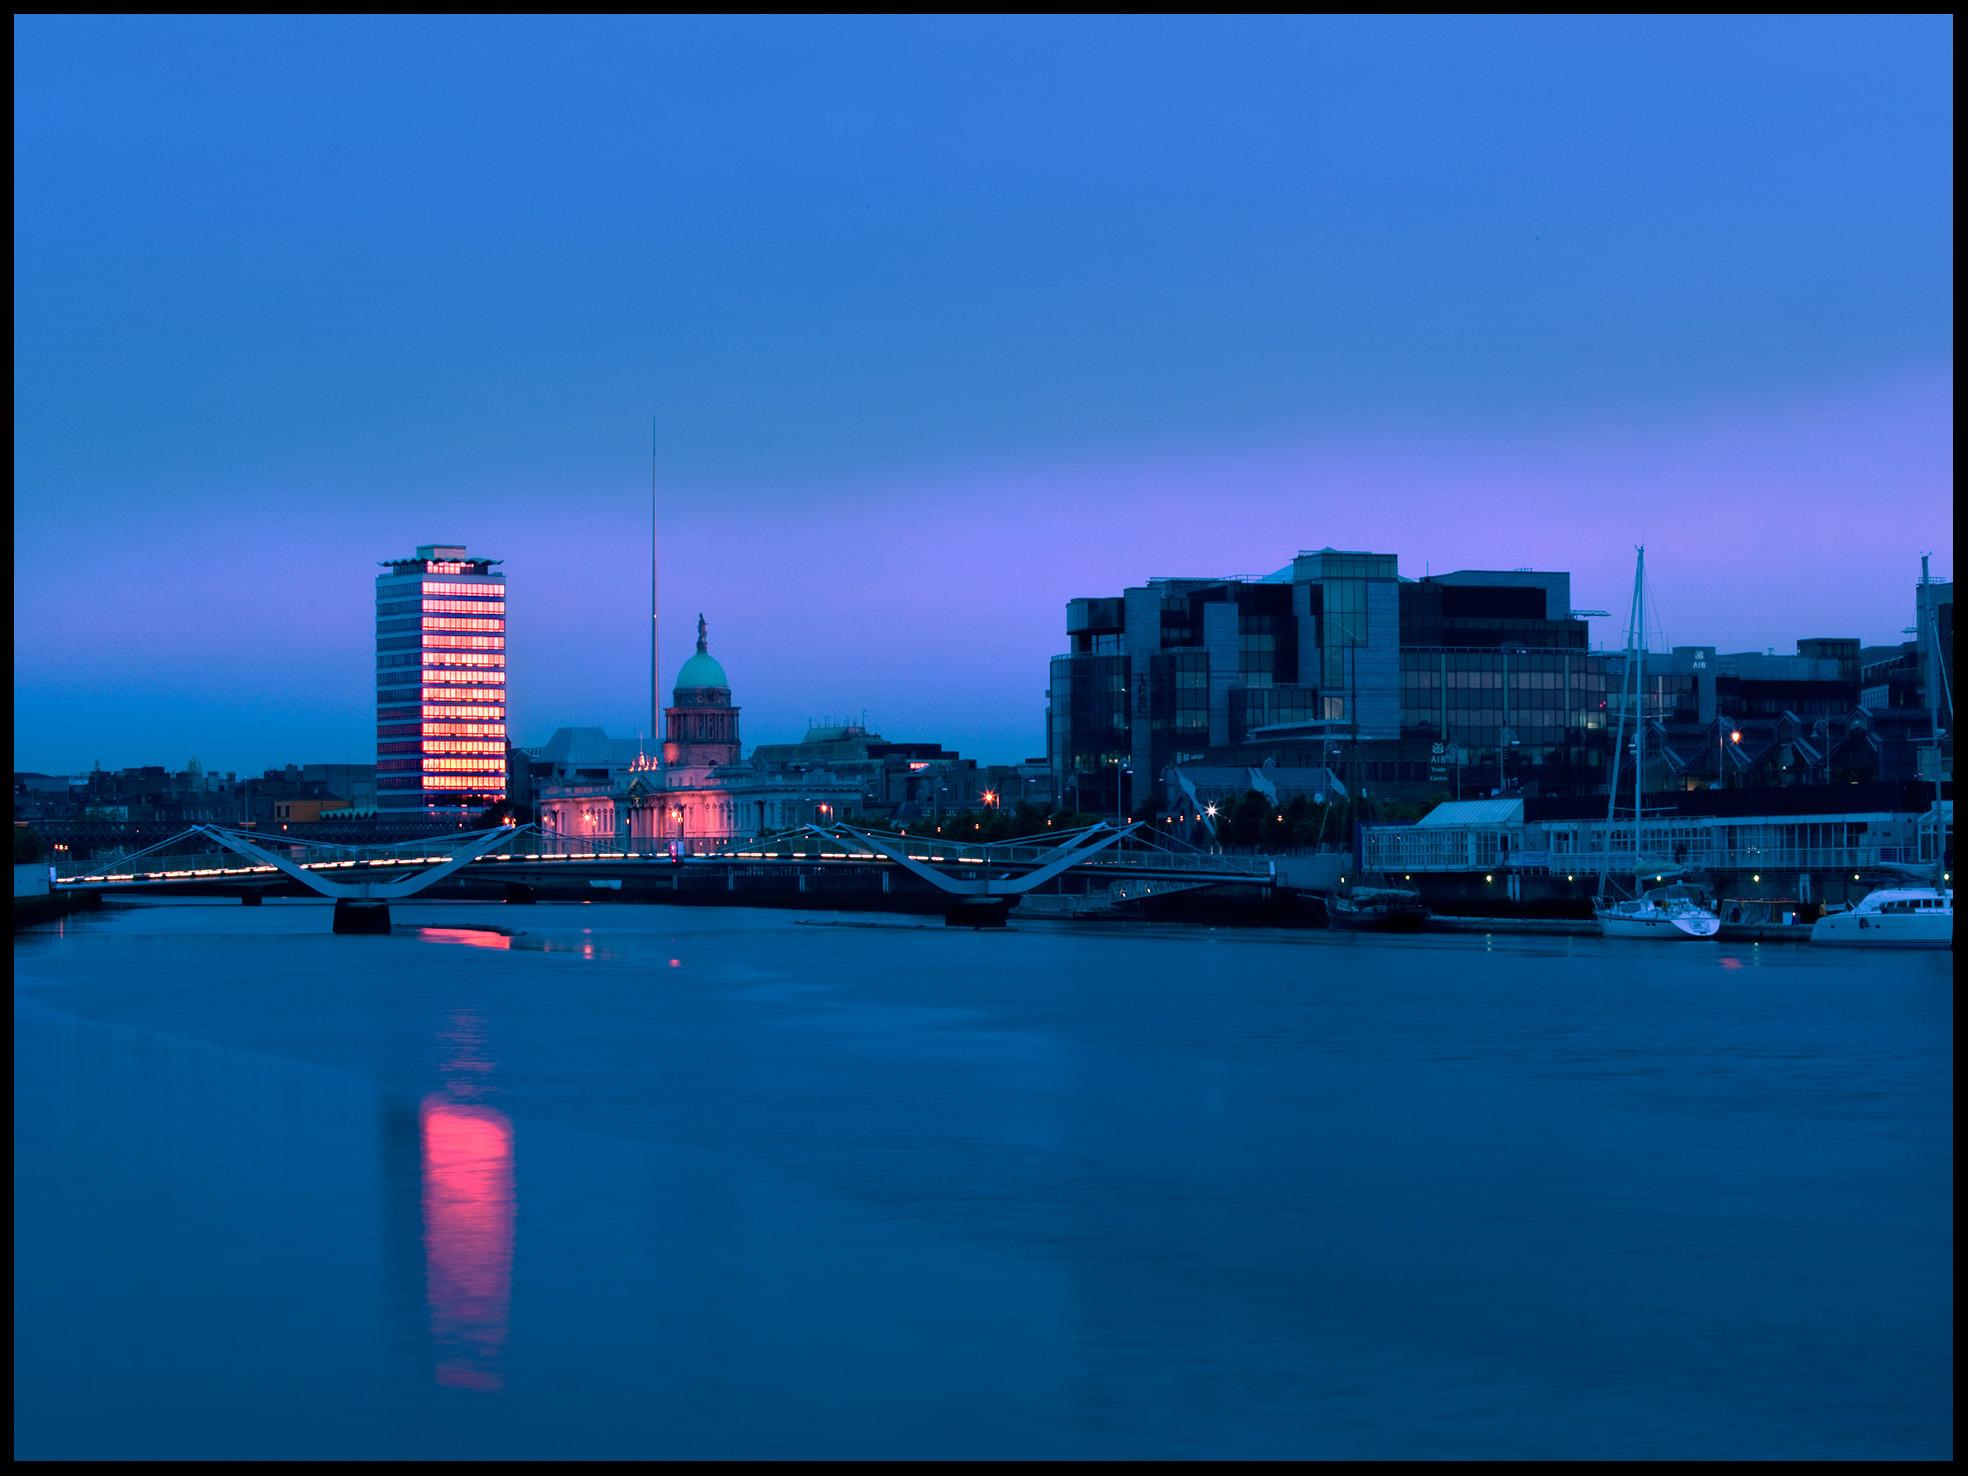 Dublin Dockland Development